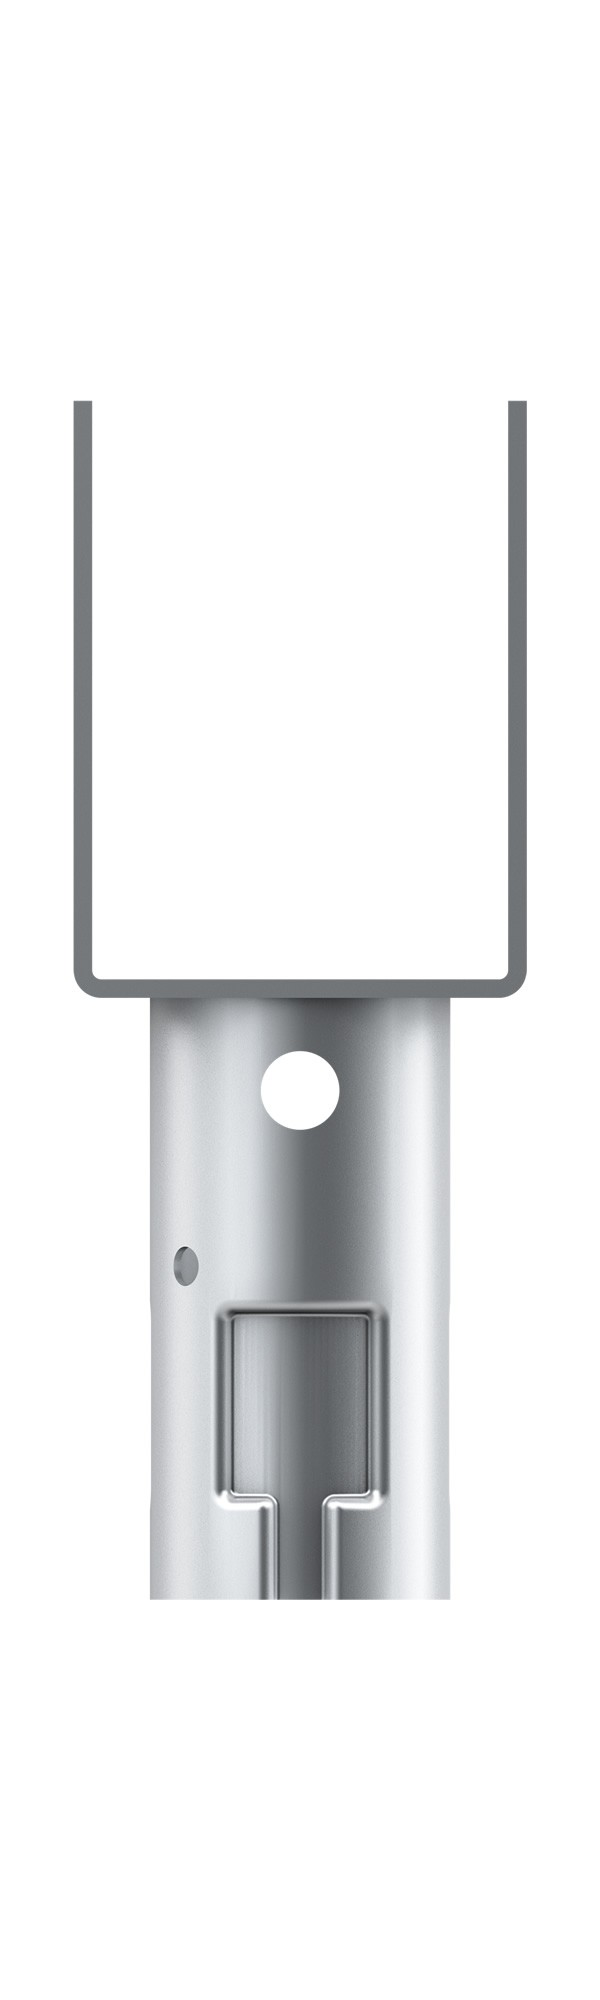 Patka vrutu Bayo.s U 70 mm